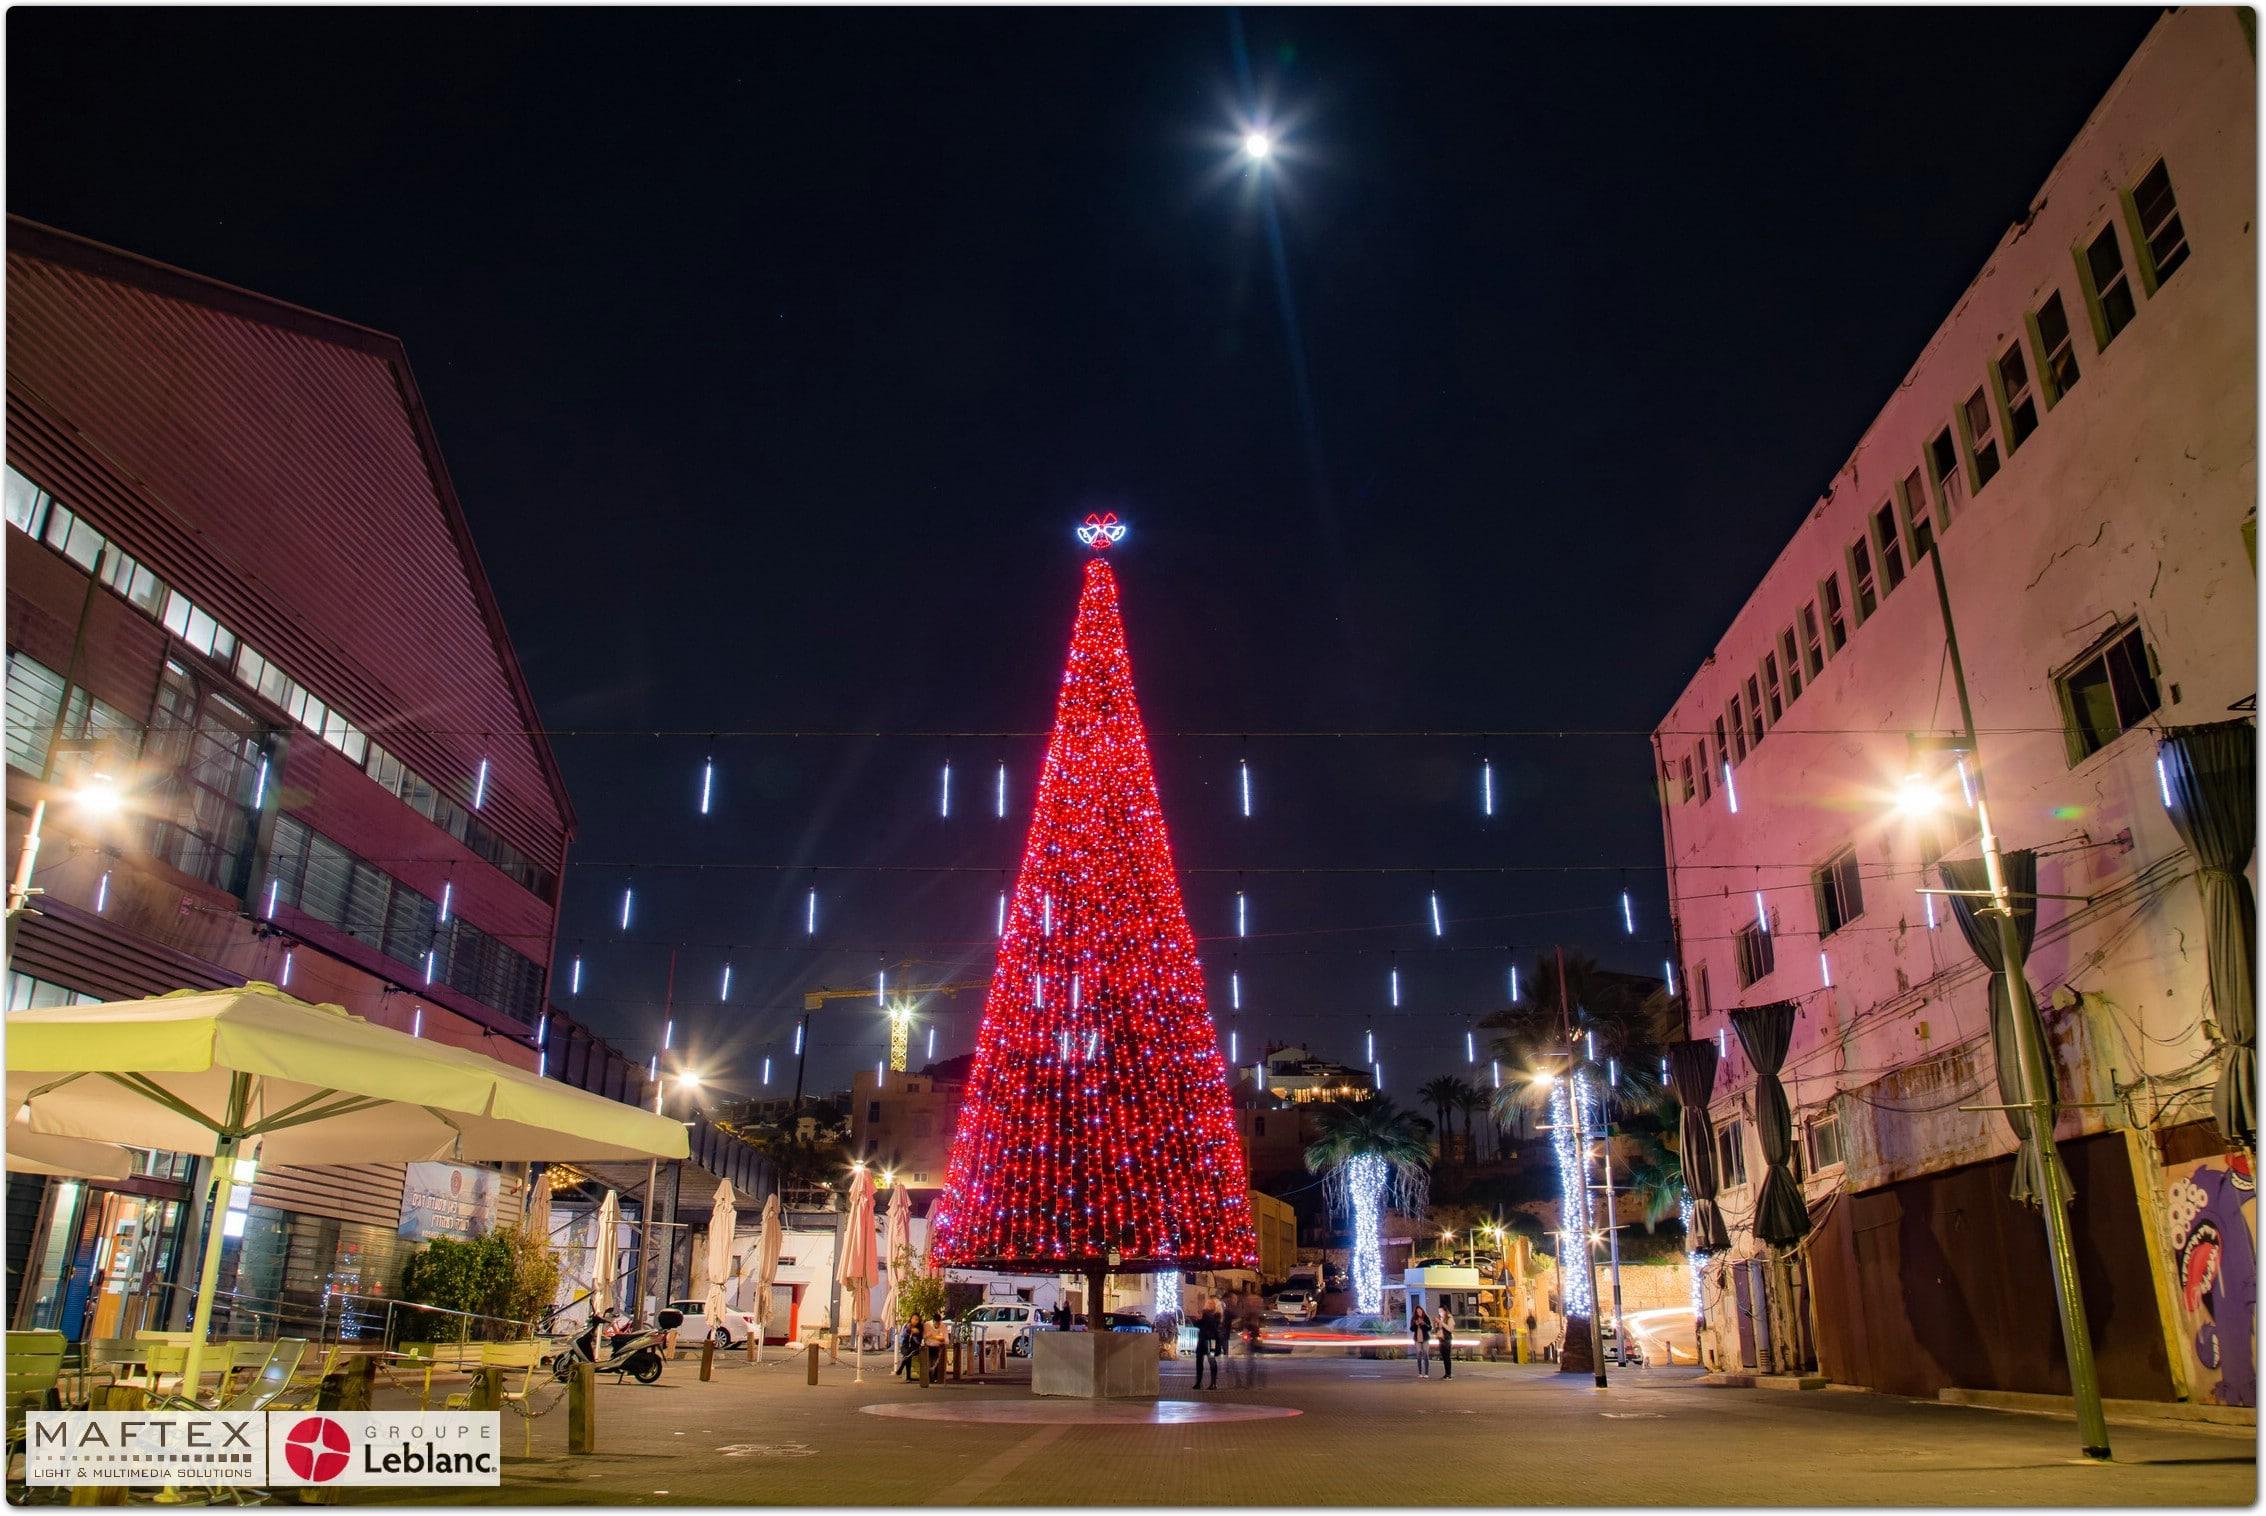 JAFFA Christmas Market Lights (3)